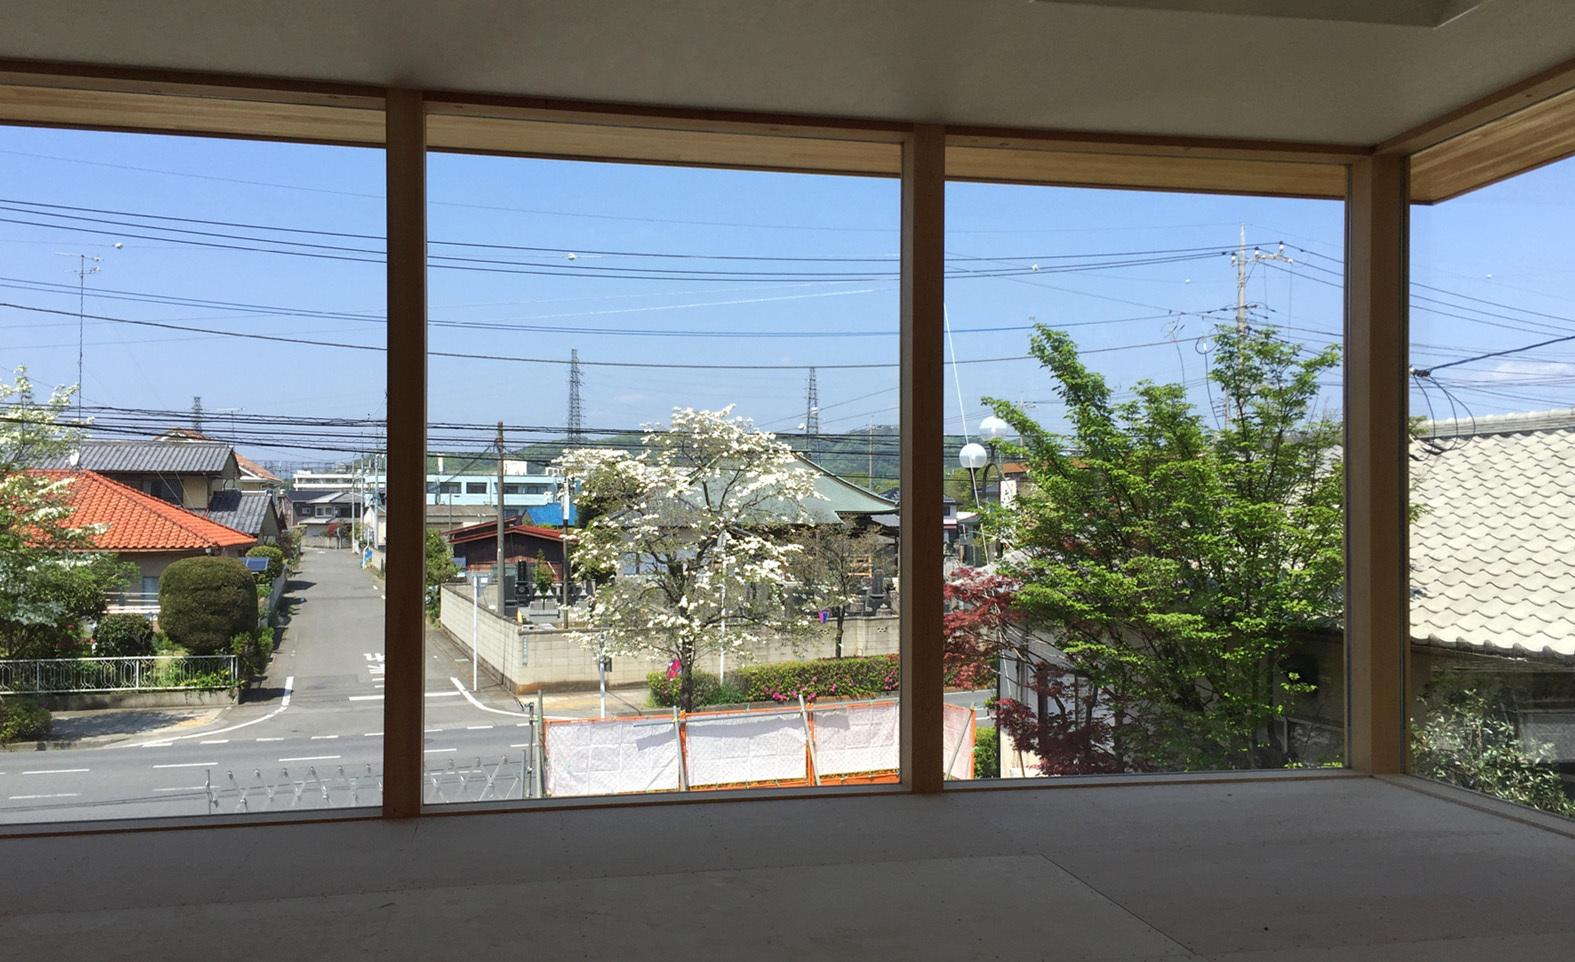 赤門セミナー太田校 床下配線 2畳の吹抜_e0127948_08565077.jpg